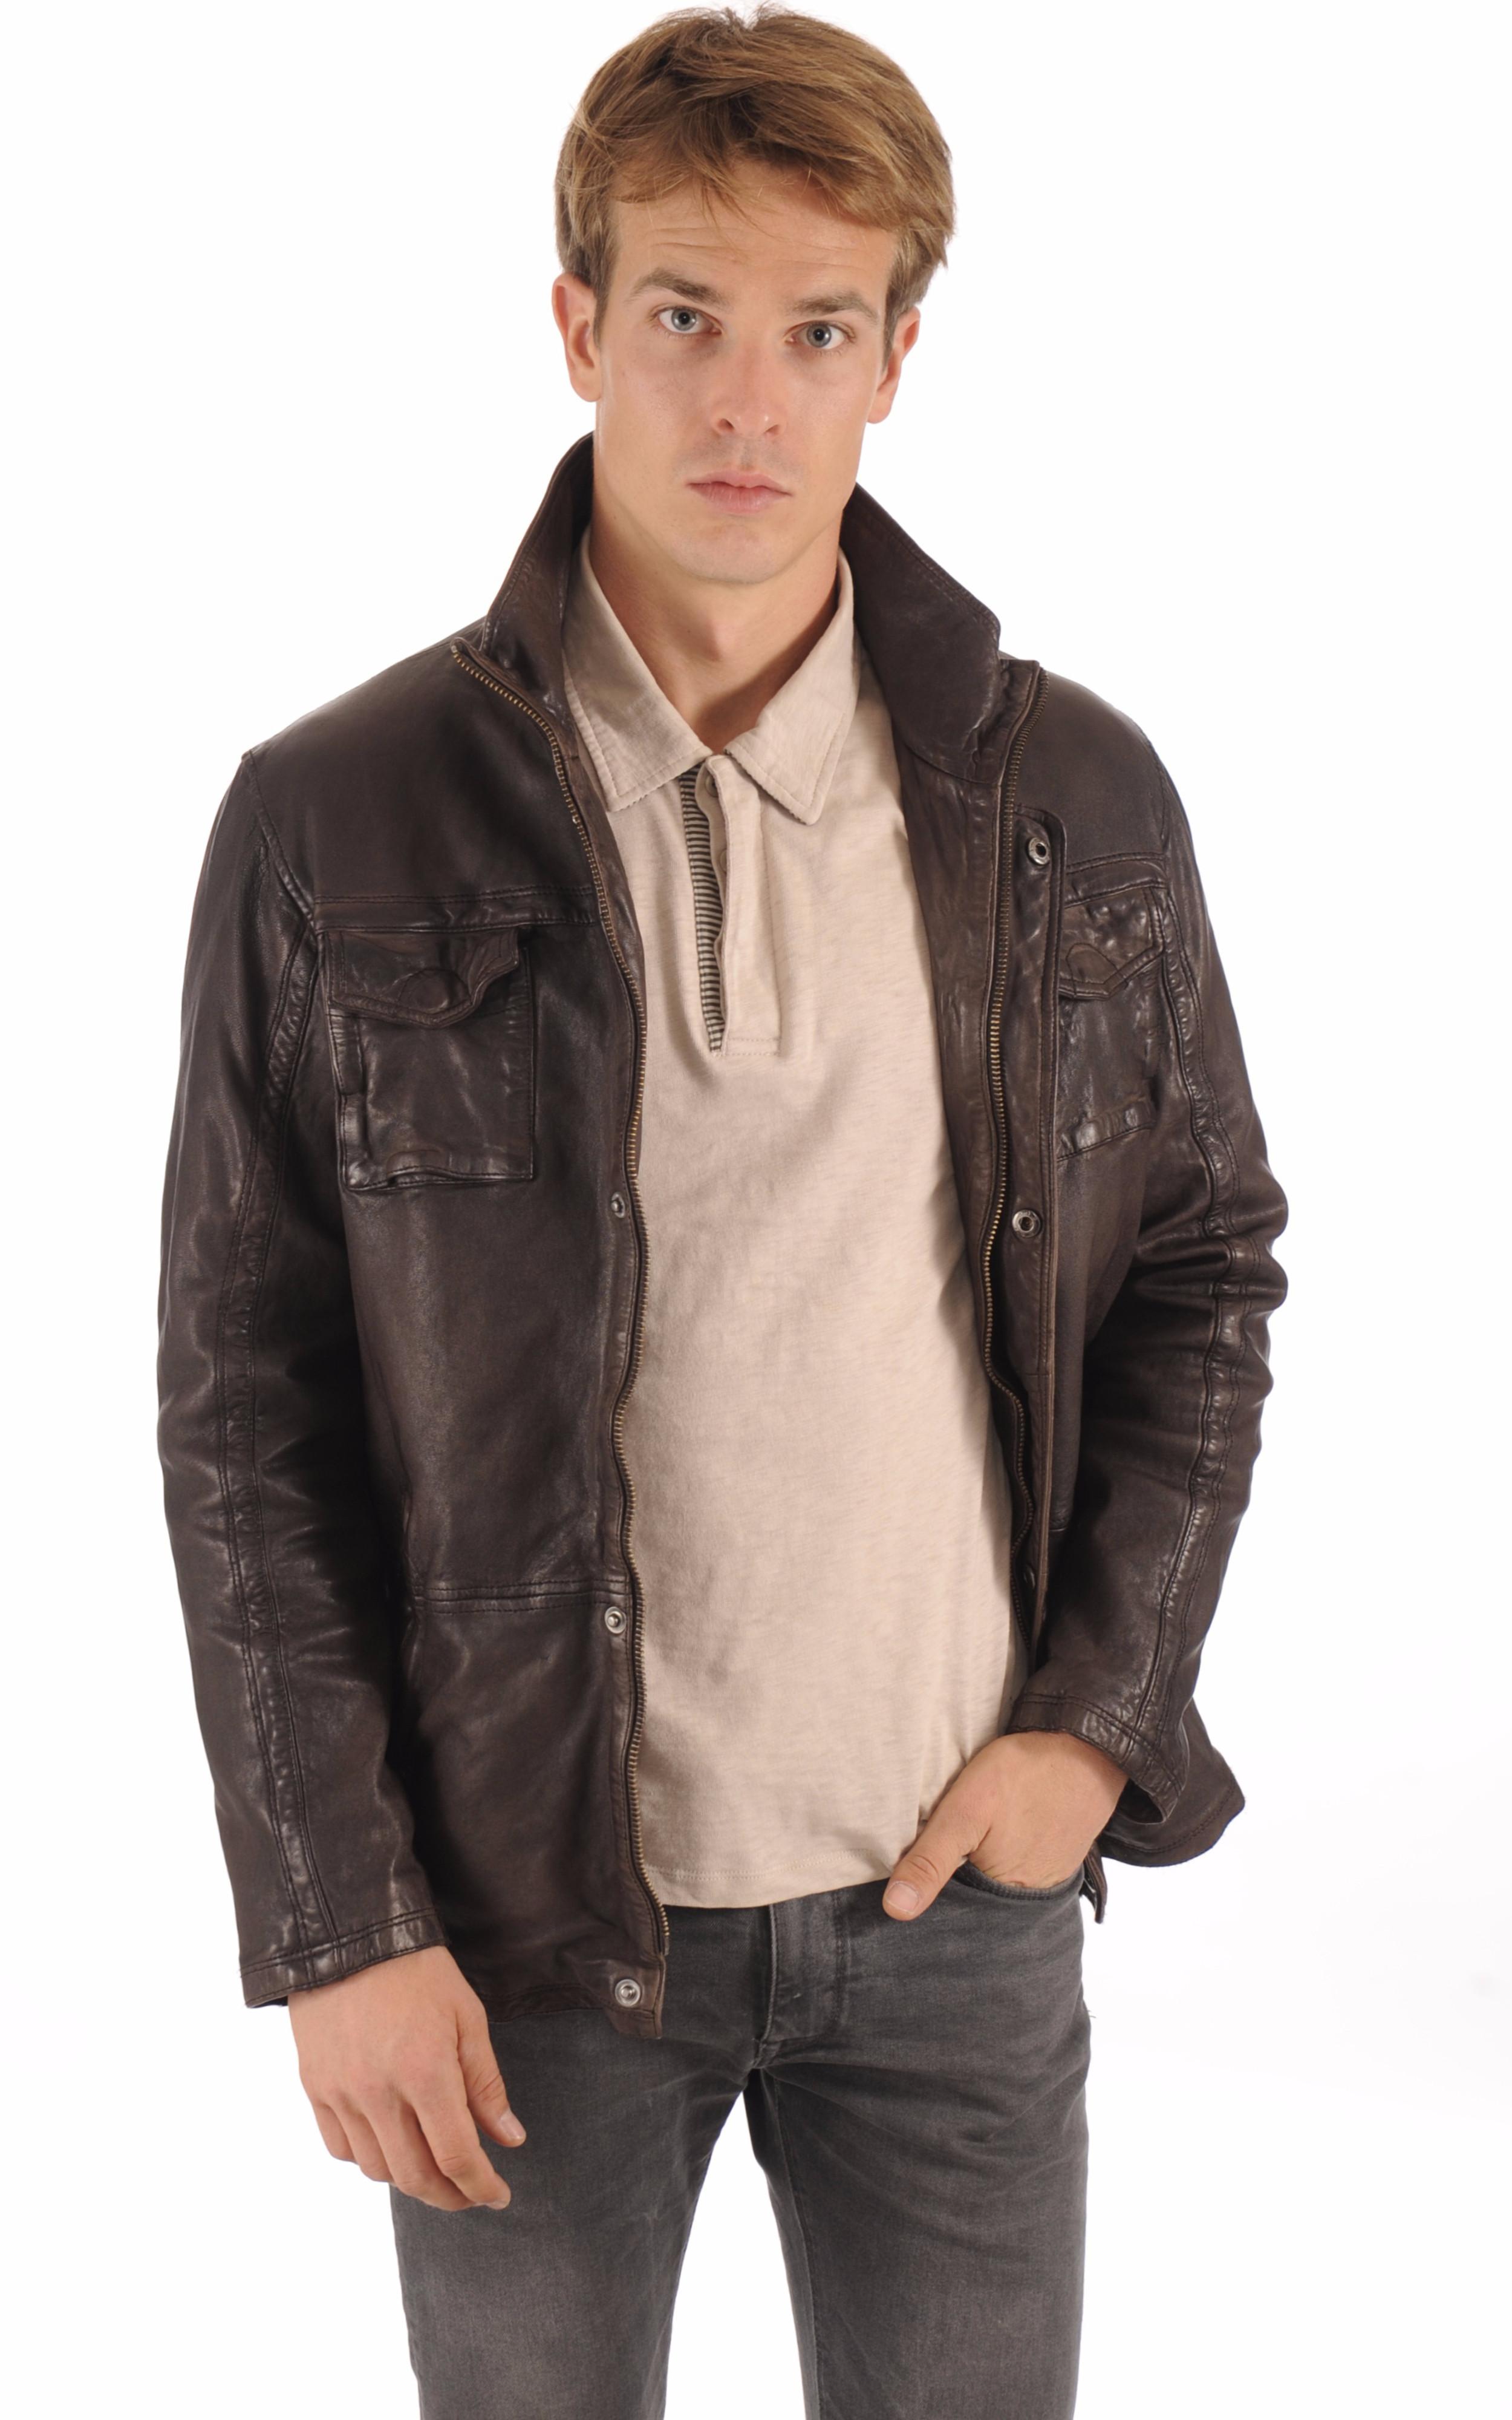 Veste confortable Cuir Homme Trapper